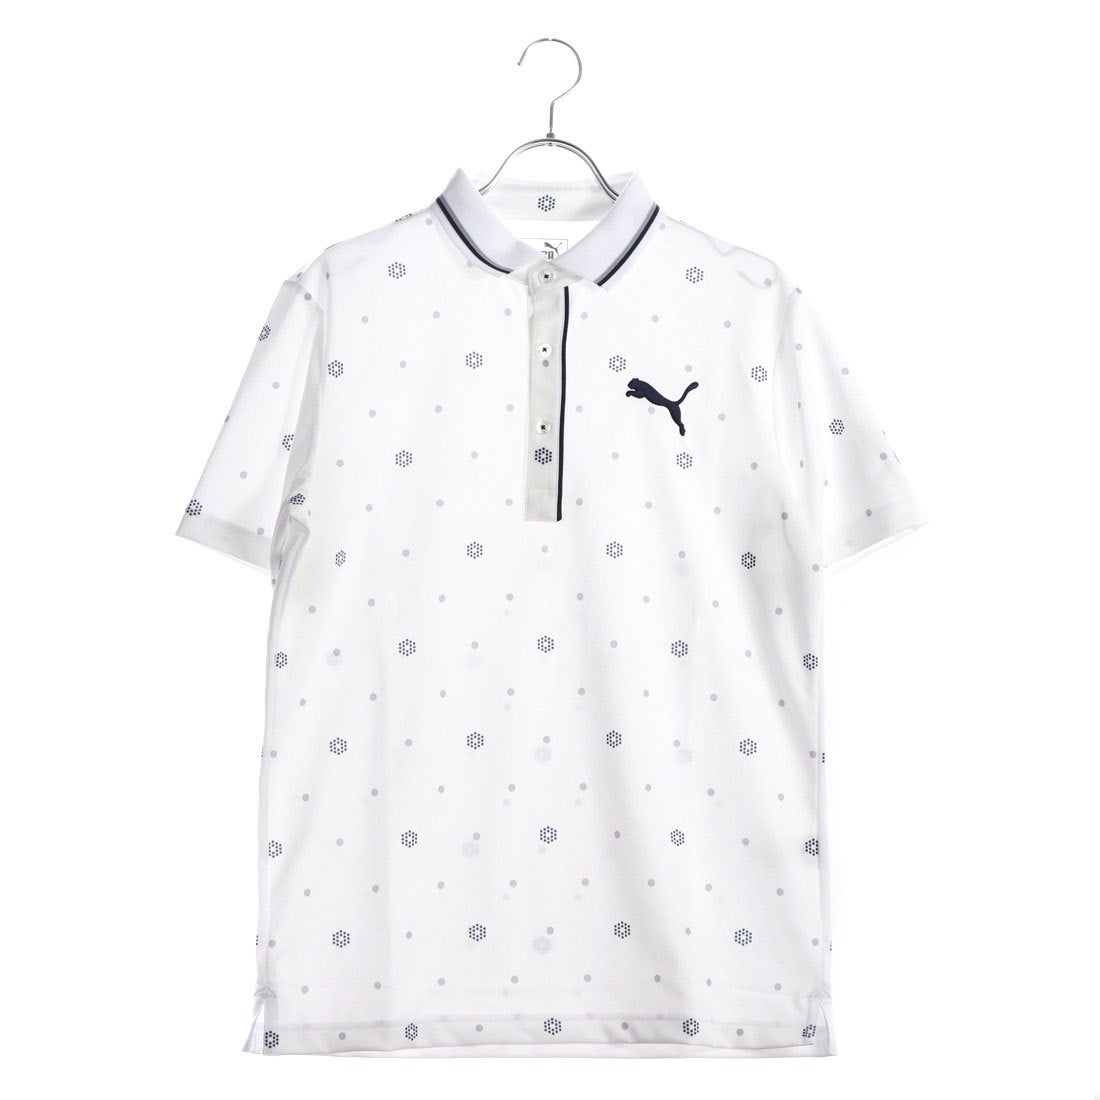 YUNY Mens Long-Sleeve Plaid Cozy Formal Classic Oxford Poplin Shirt 26 M